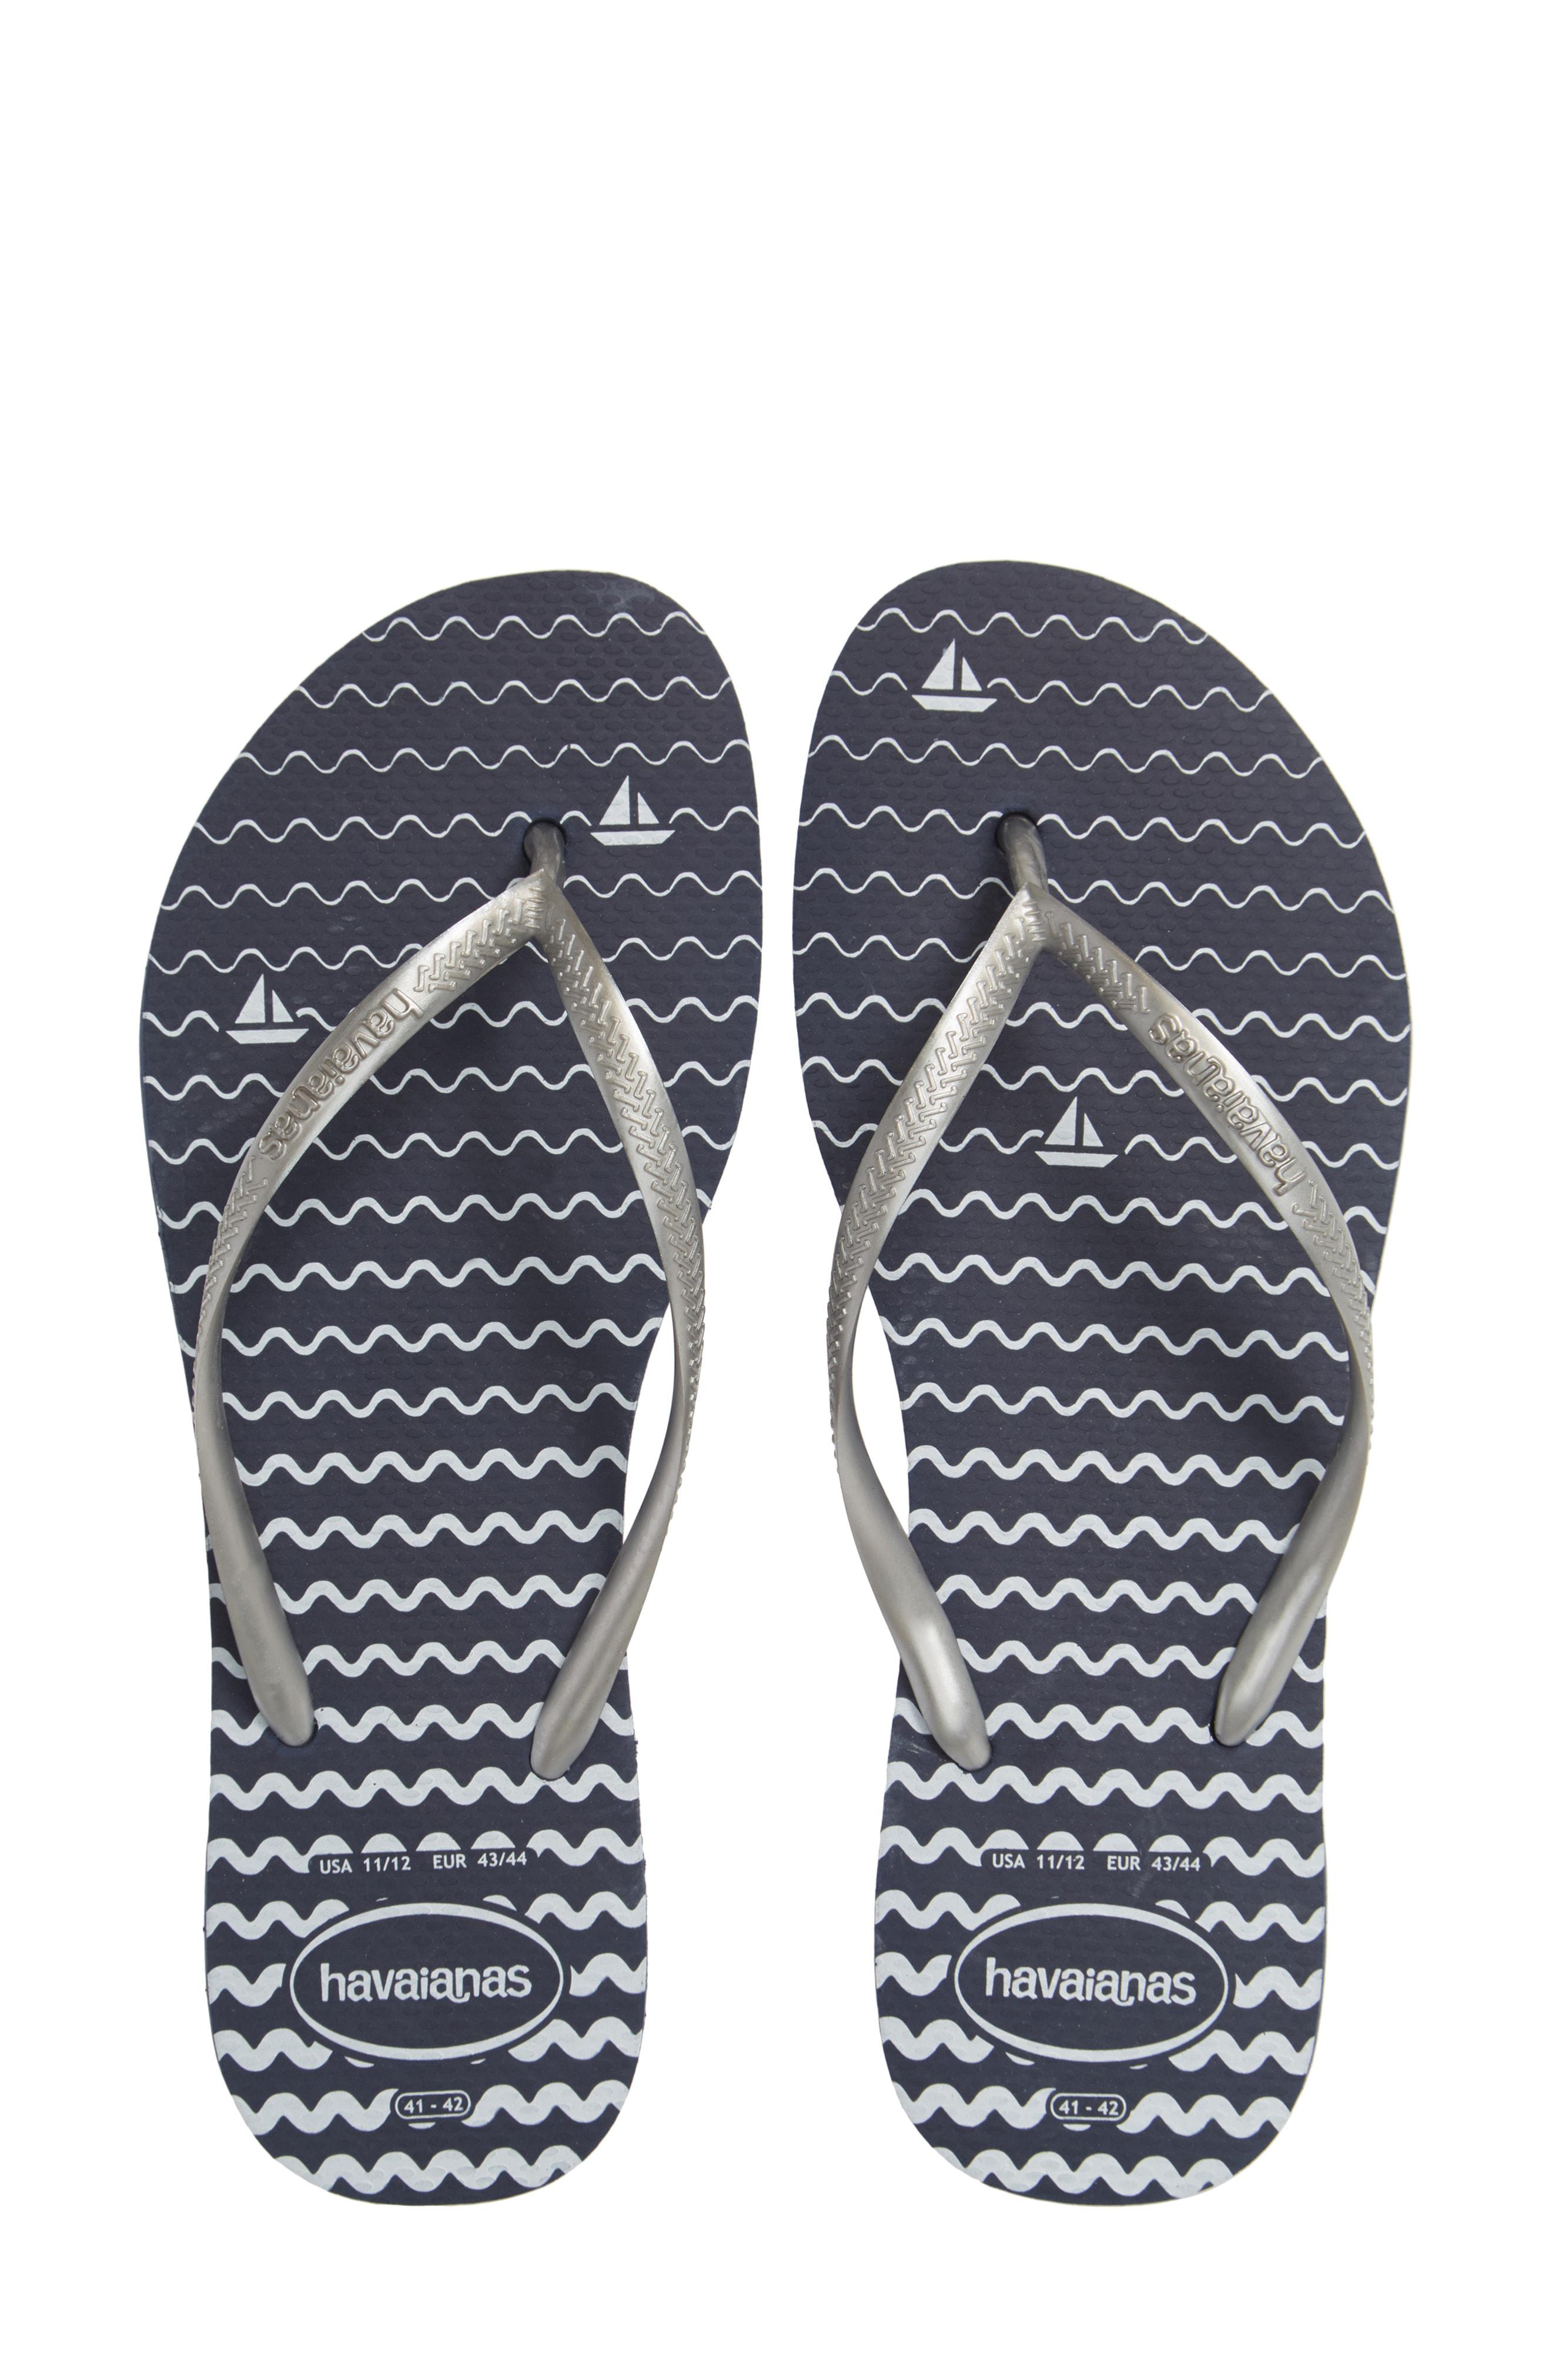 9a13aa347569 Havaianas Slim Oceano Flip Flop In Navy Blue